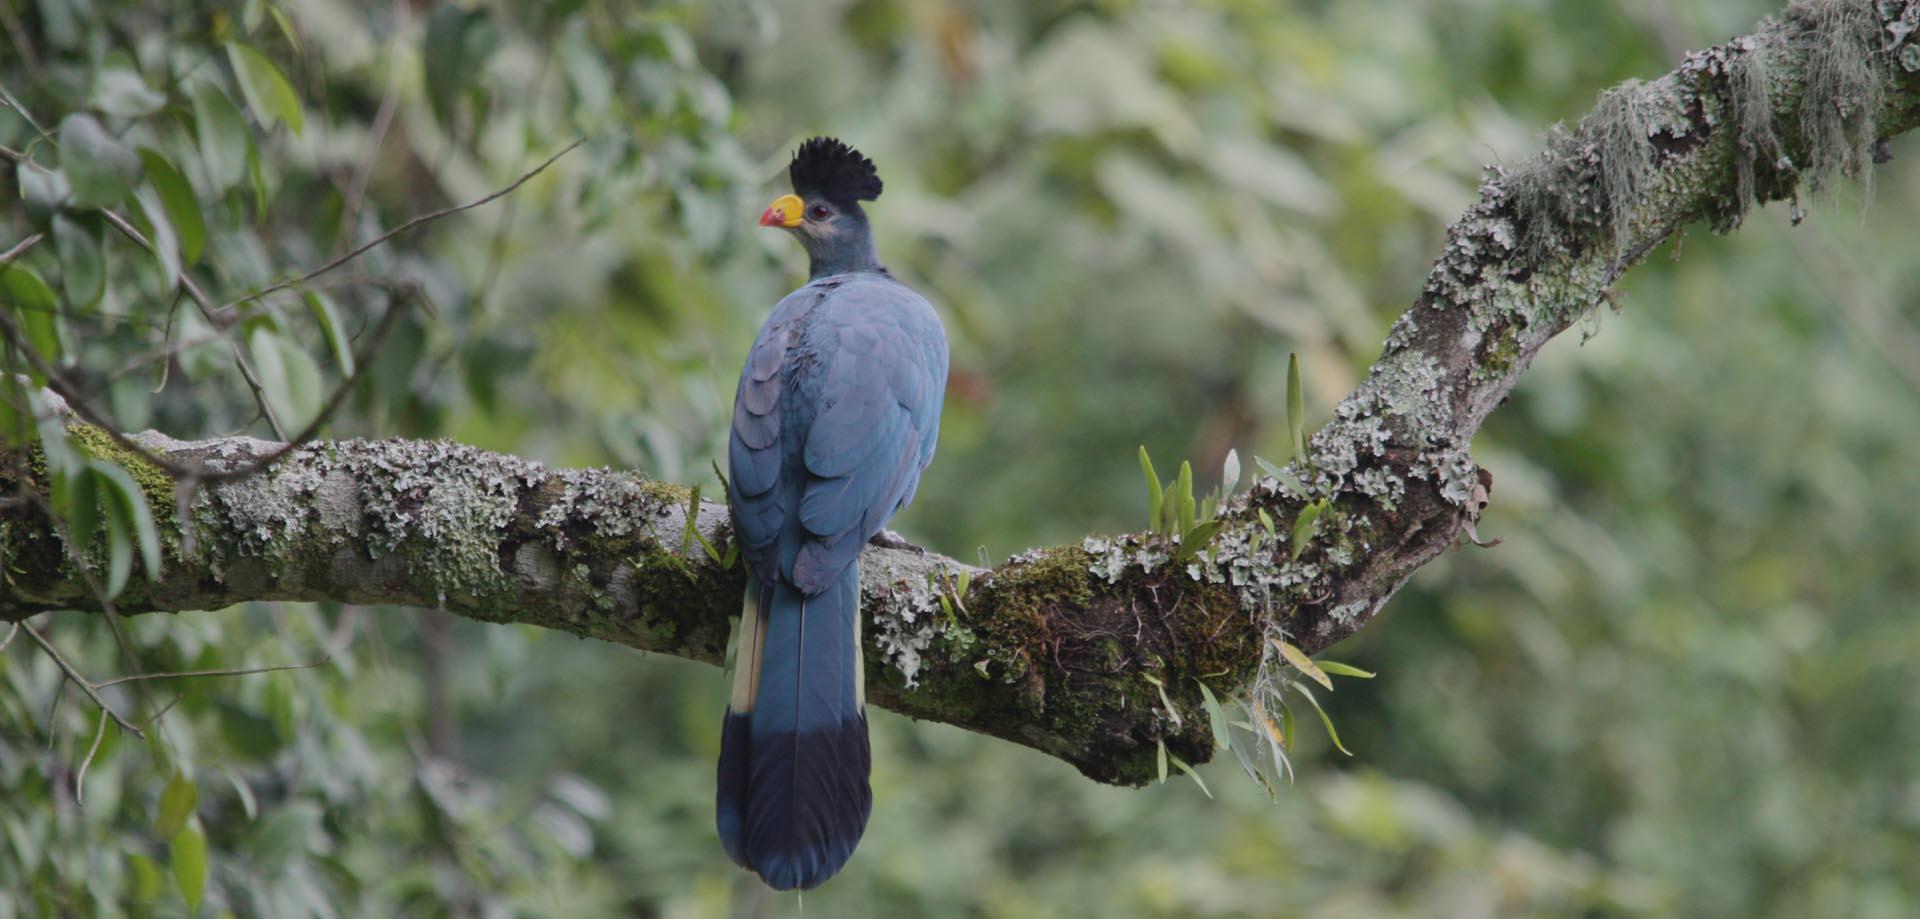 bird watching in Bwindi Uganda,Birding trips in Bwindi forest